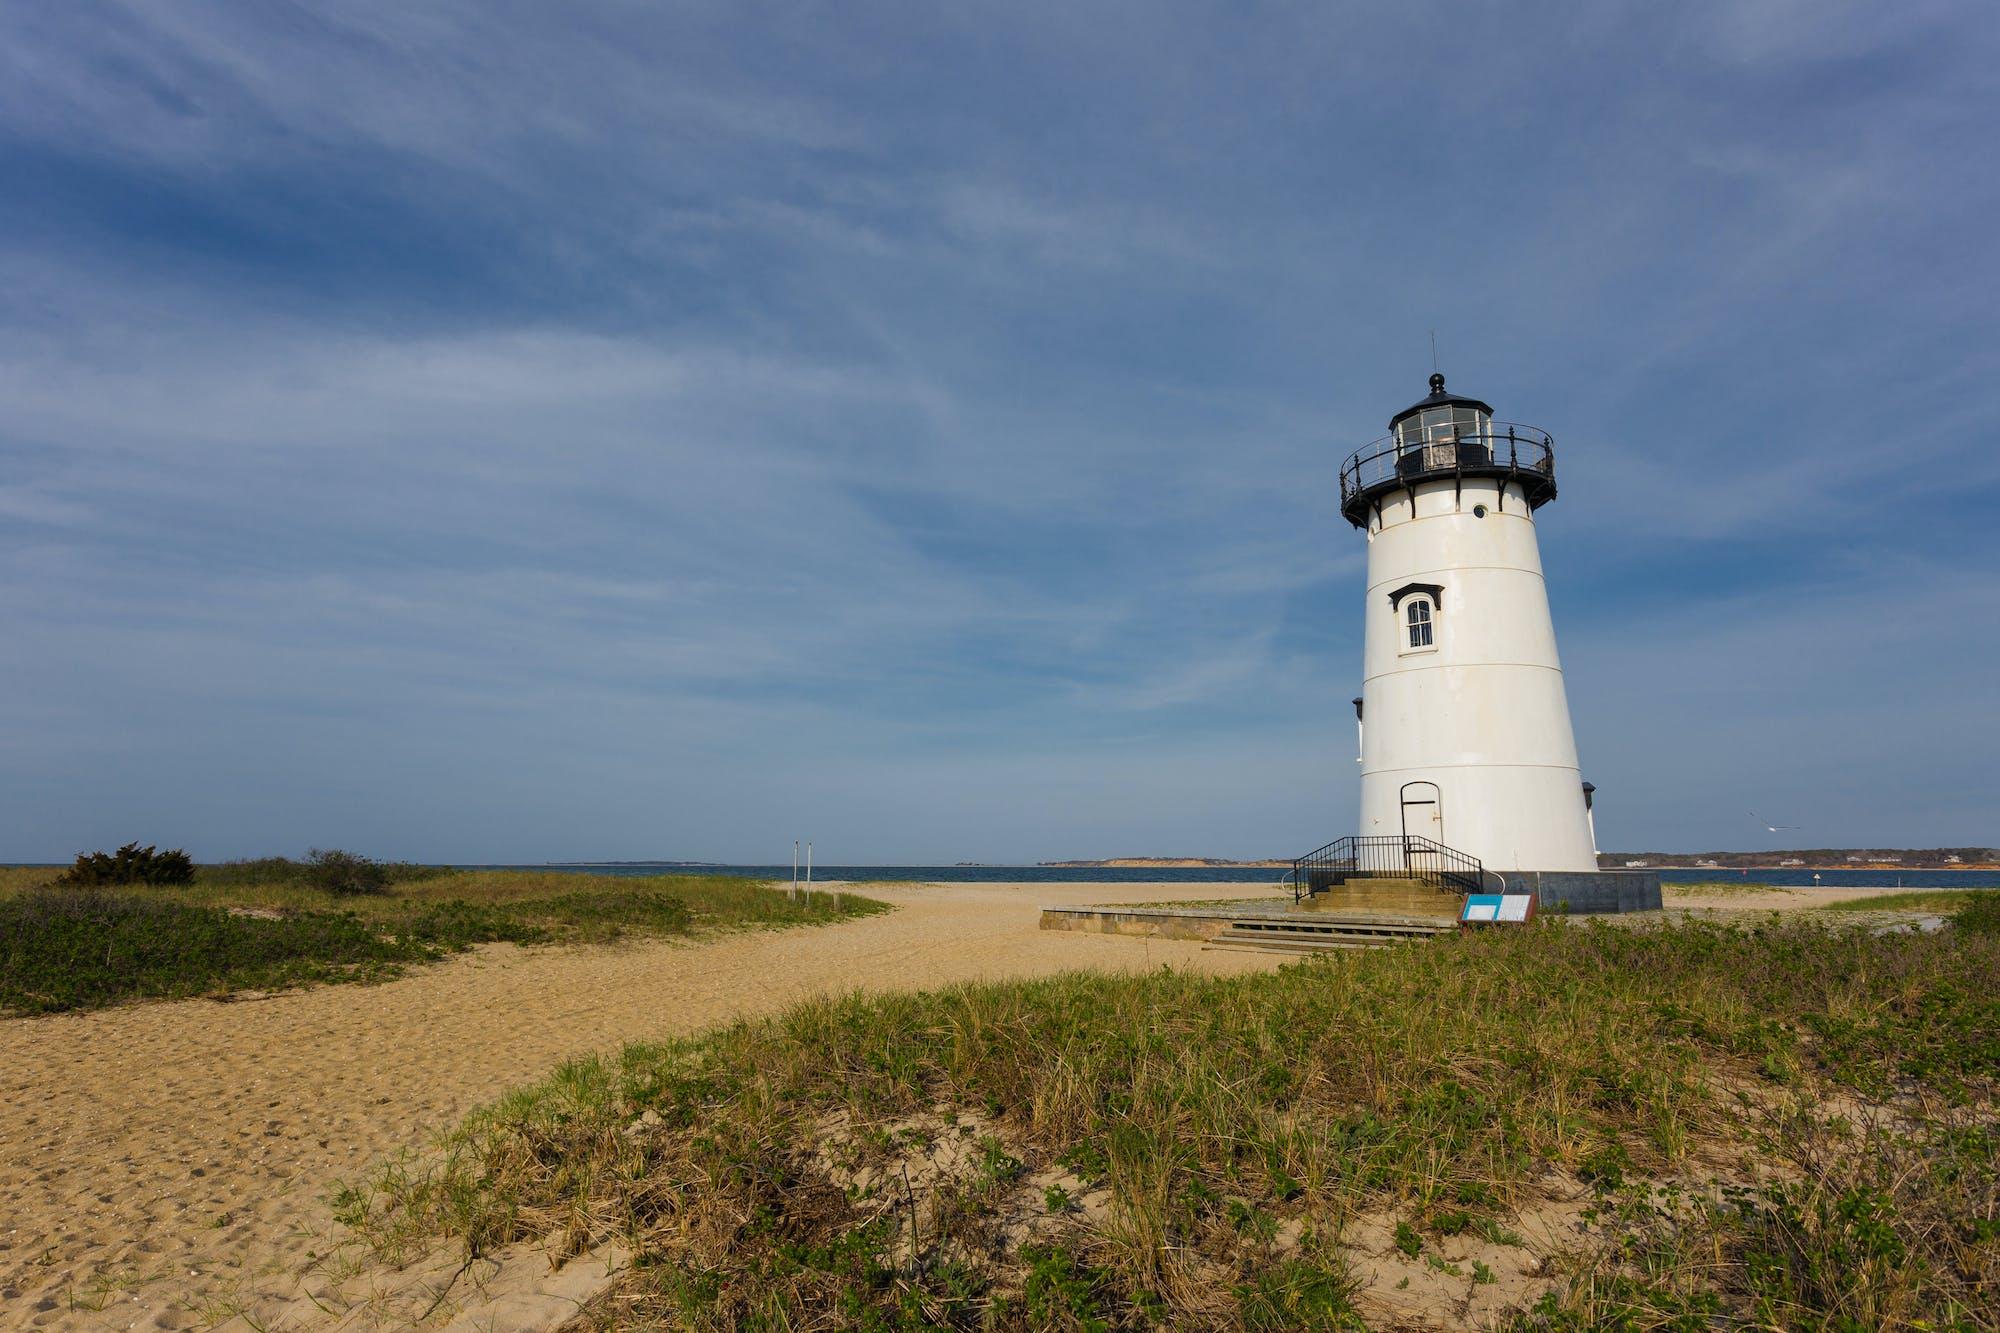 Lighthouse at Oak Bluffs on Martha's Vineyard, Massachusetts